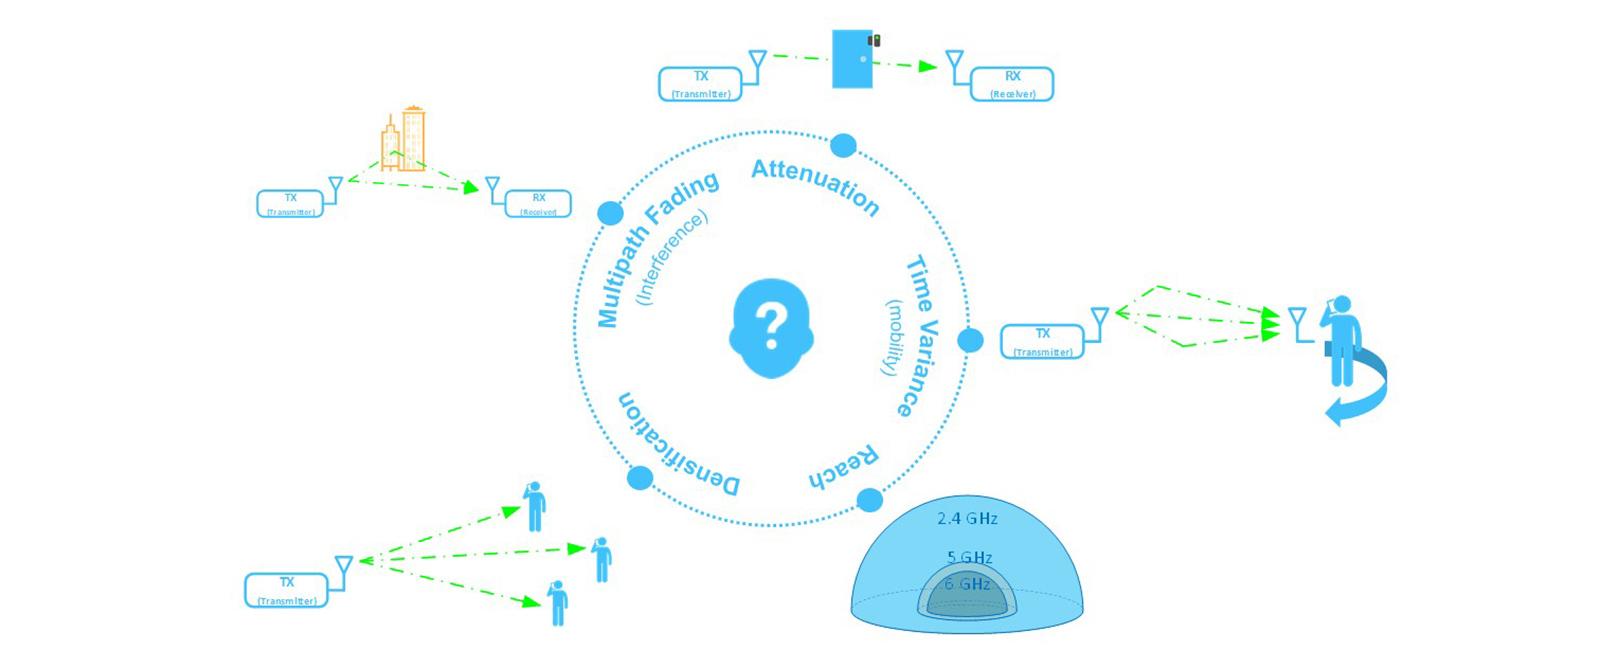 wireless challenges diagram